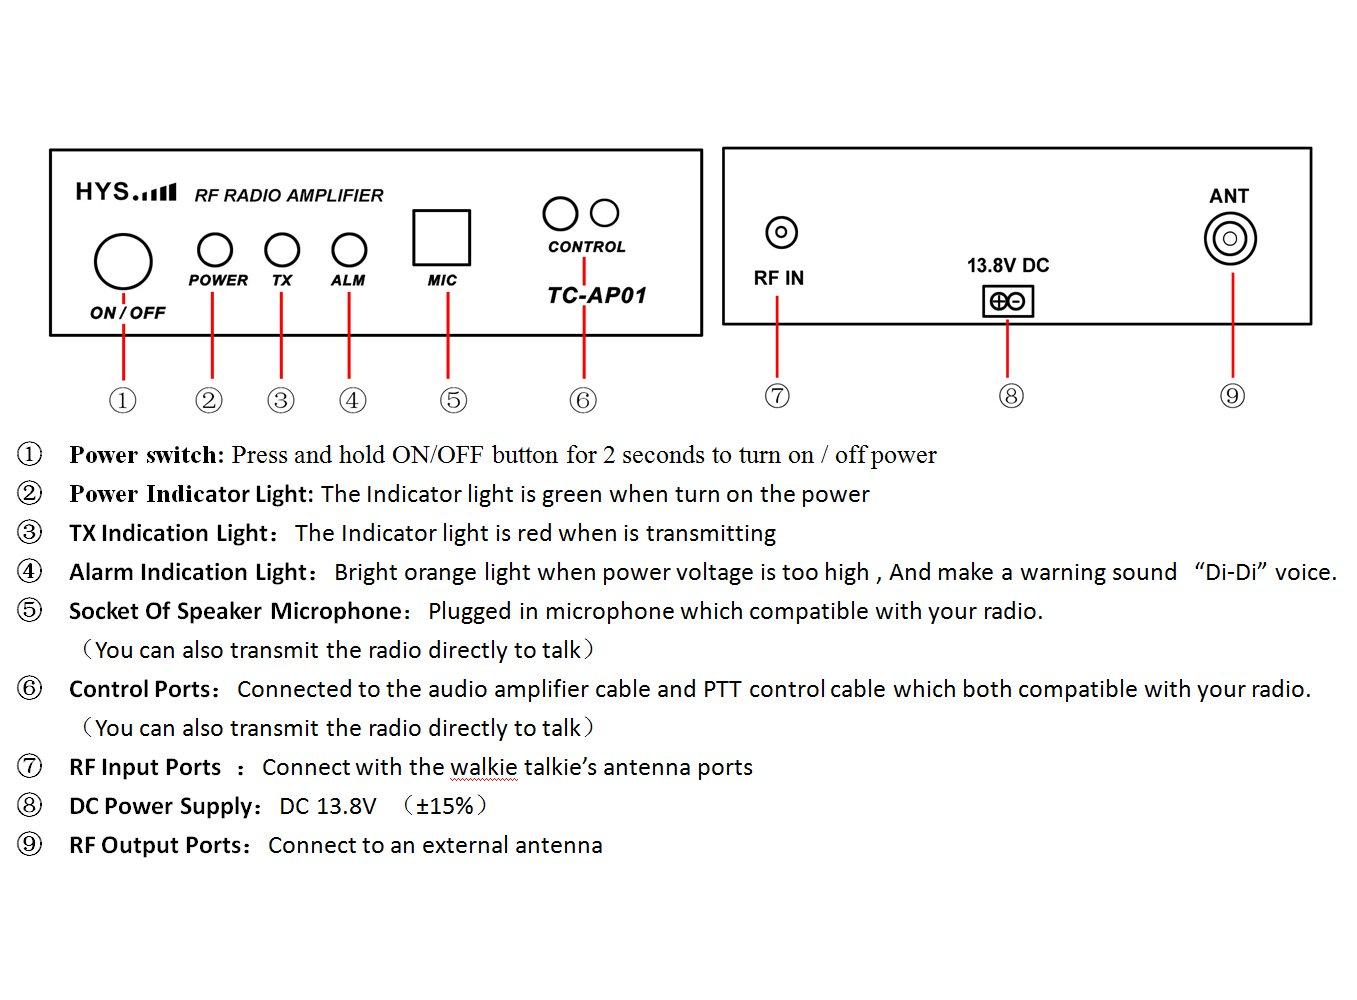 HYS 25W VHF 137-174MHz 2M Ham Walkie Talkie Power Amplifier For Motorola GP328 GP338 PRO5150 PRO7150 GP320 2 Way Radio by HYS (Image #6)